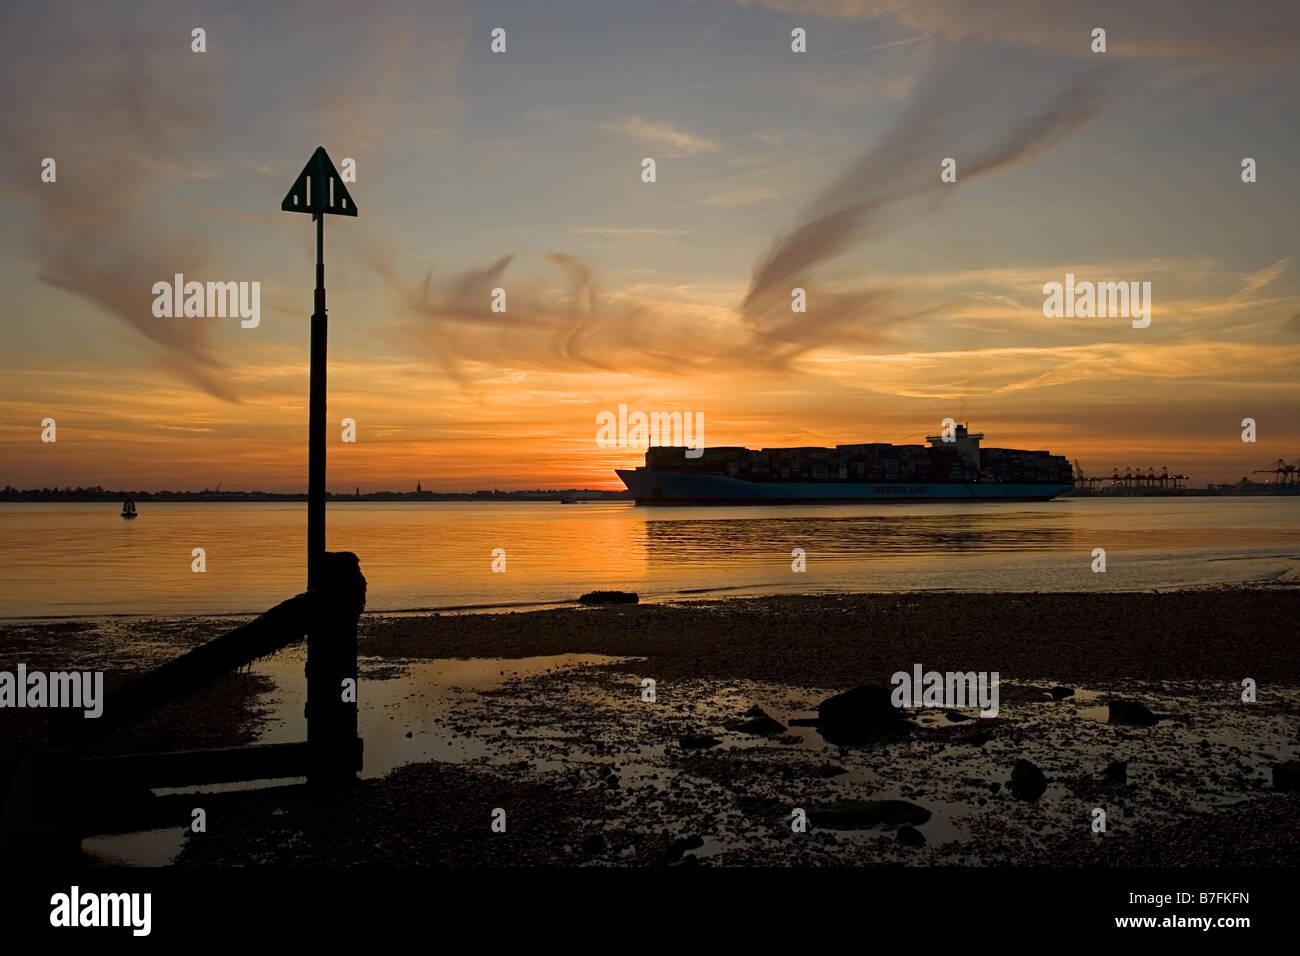 Freighter leaving Felixstowe Docks - Stock Image